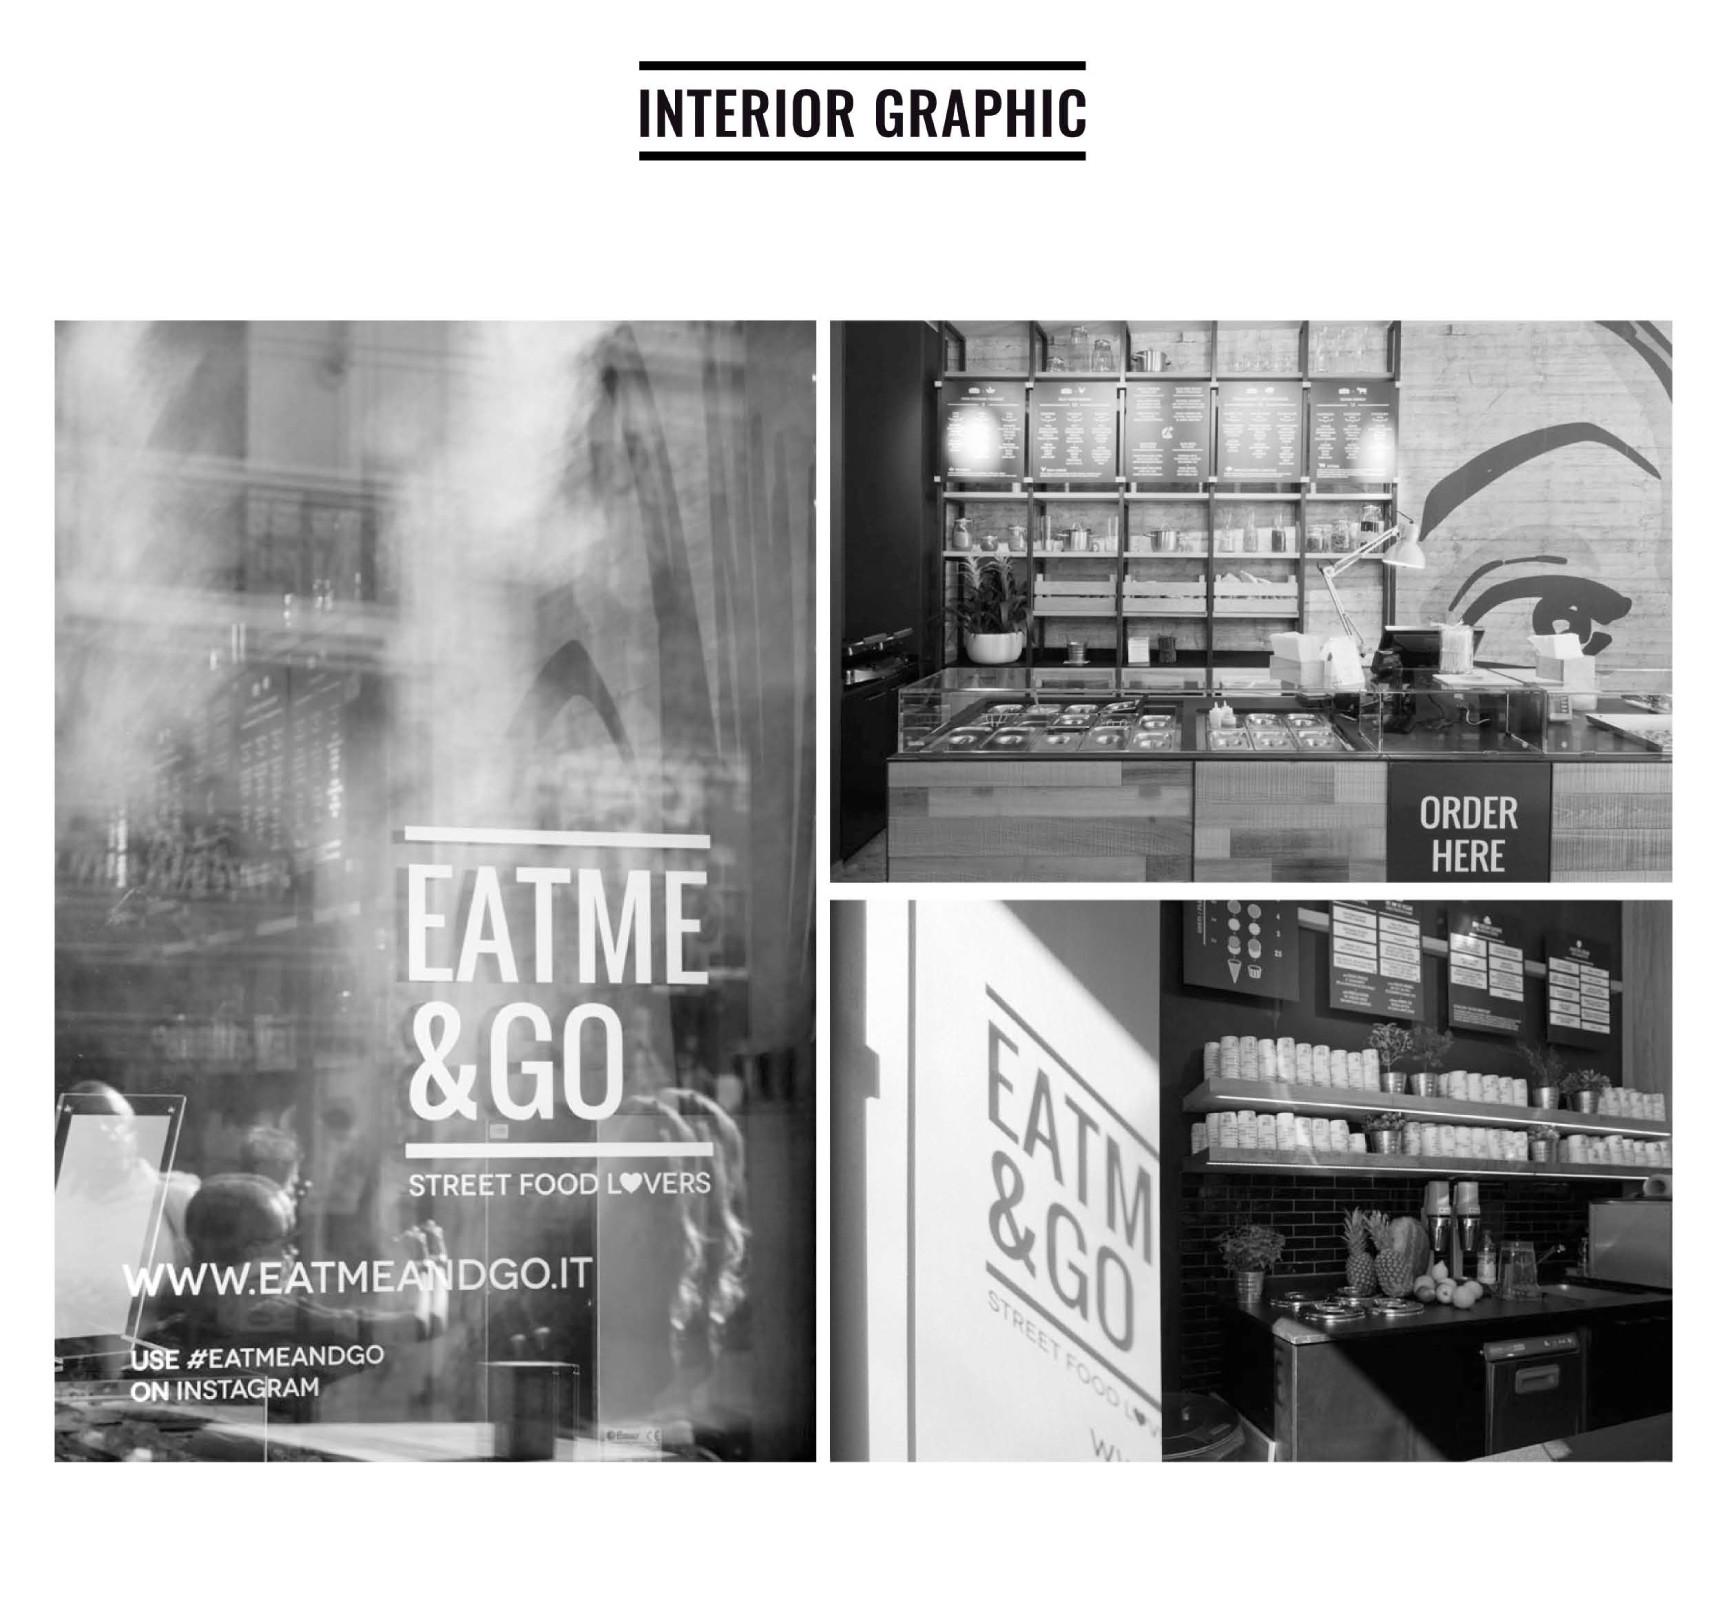 mintlab-brandidentity-eatme&go-interior-graphic